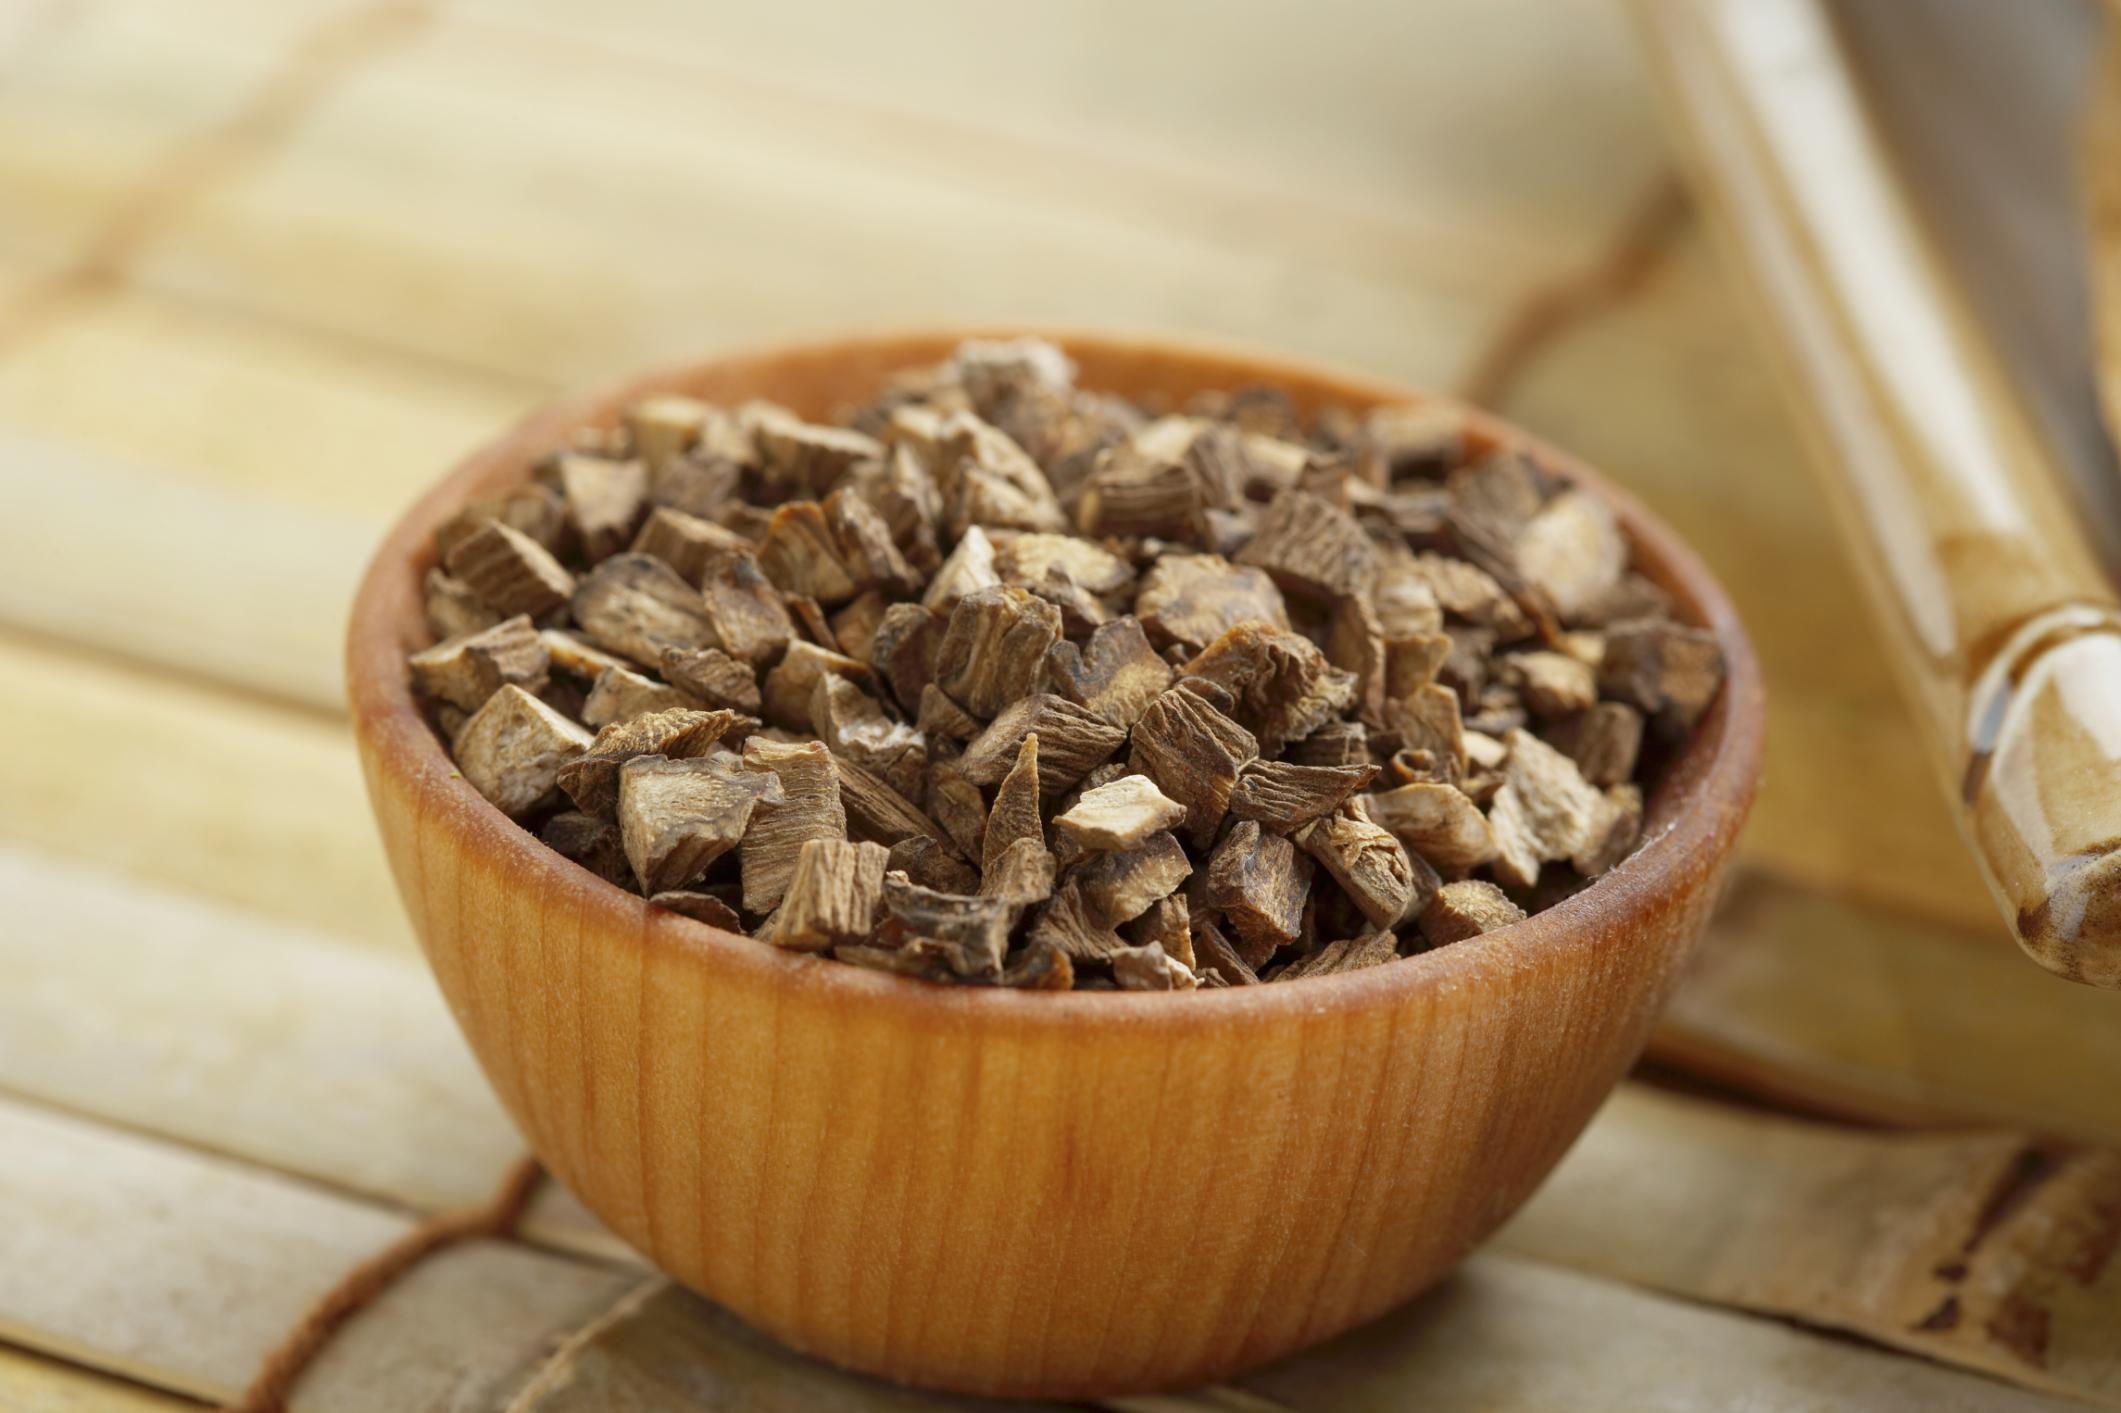 herbs to help treat dandruff